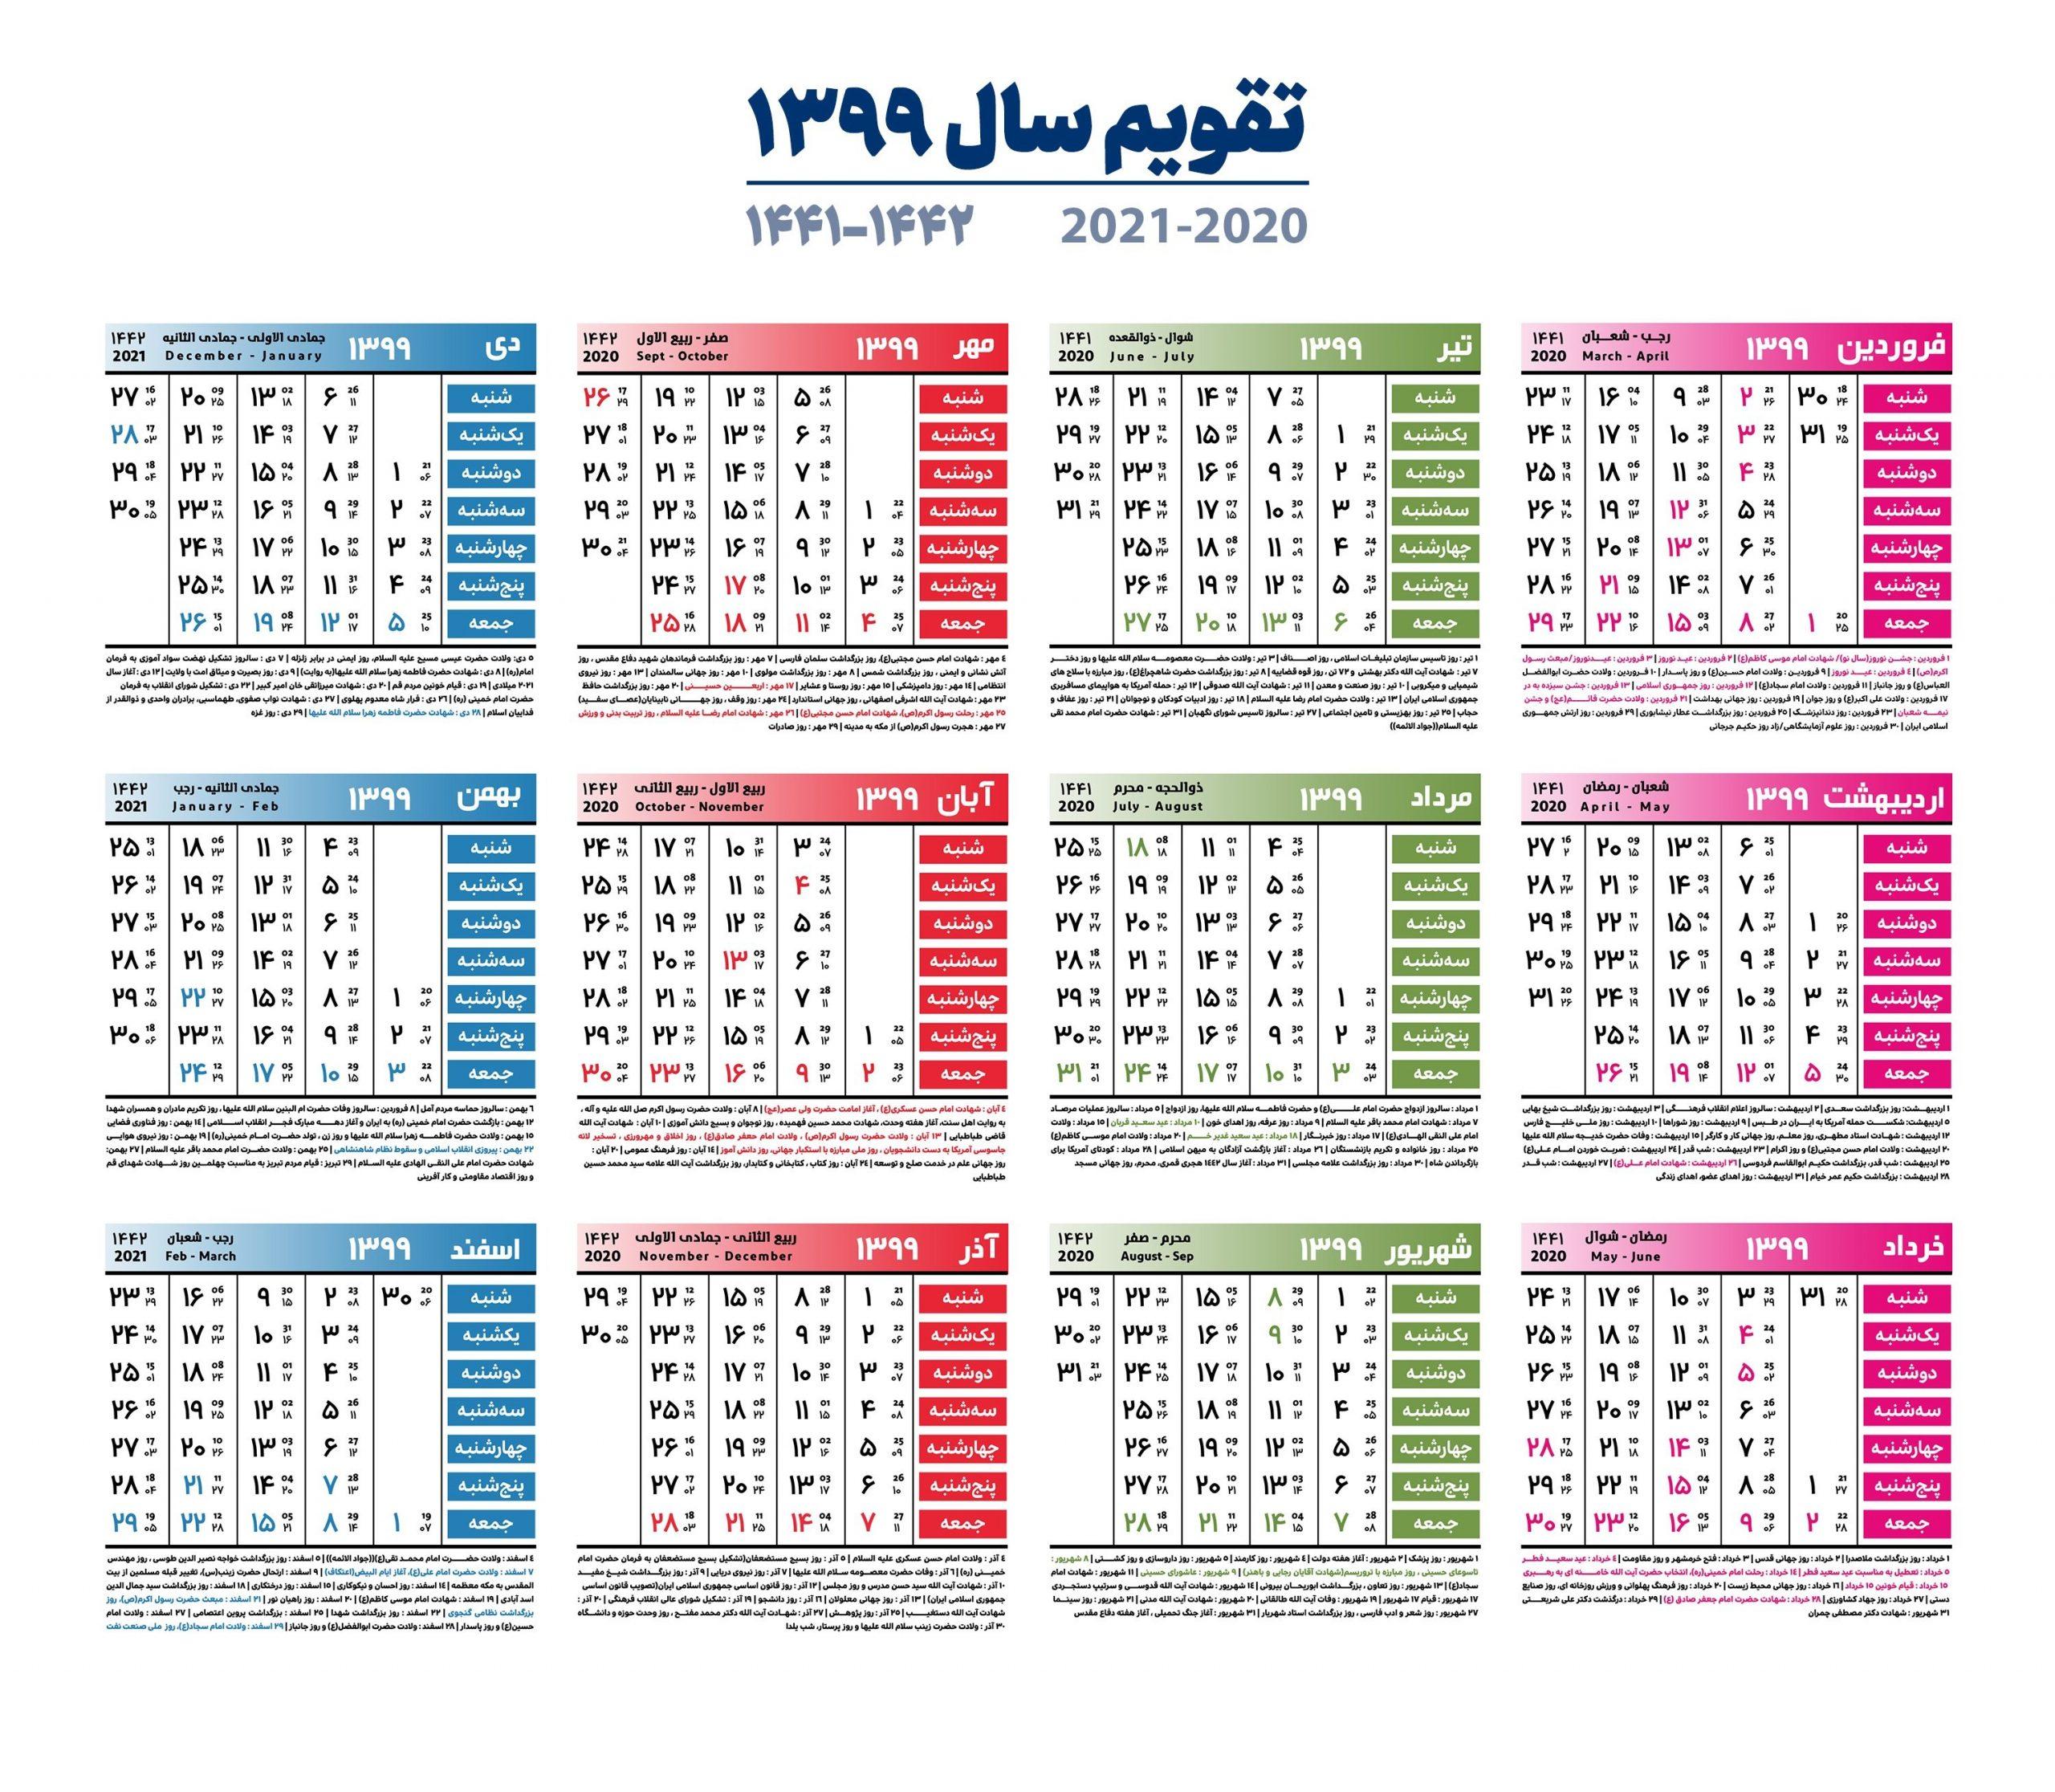 Convert Julian Date 2 025 To Calendar Date   Printable Calendar 2020 2021 Intended For Julian Date Conversion 2022